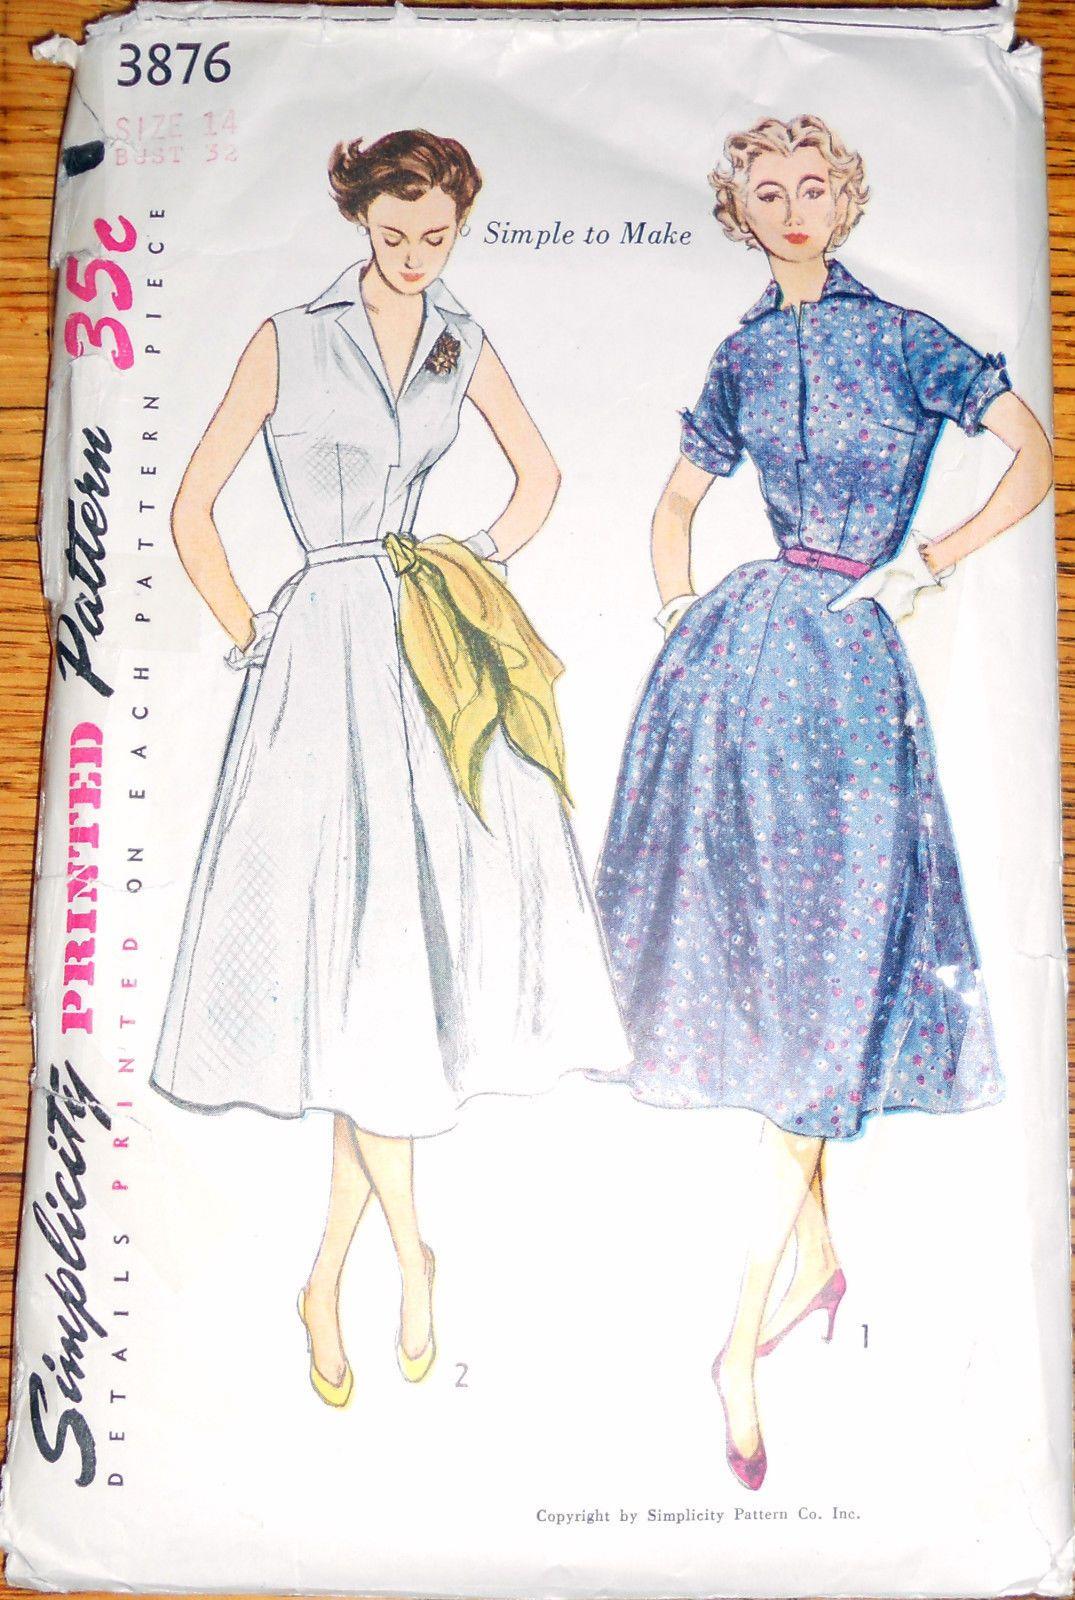 Vintage 1950\'s SIMPLICITY ONE-PIECE DRESS Sewing Pattern SZ 14 #3876 ...